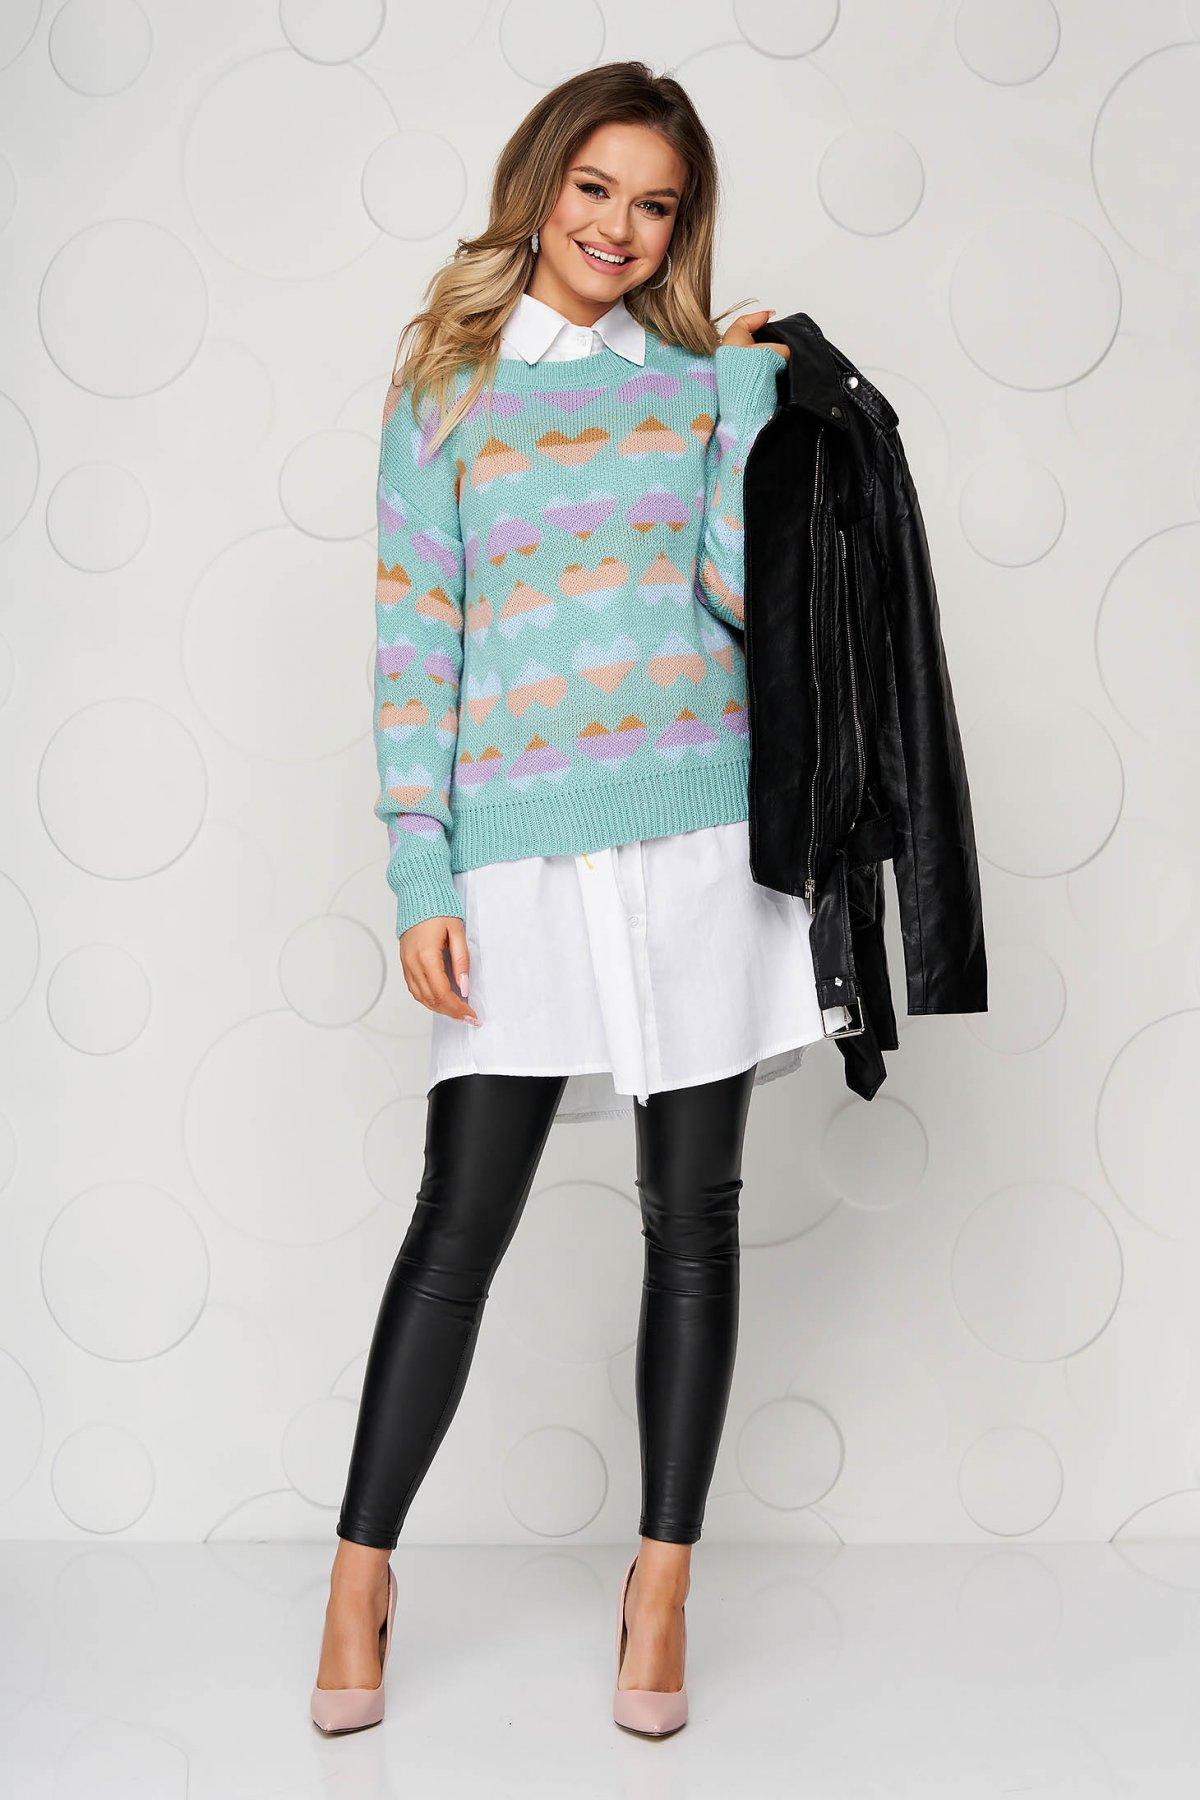 Bluza dama turcoaz casual tricotata cu croi larg cu imprimeuri grafice